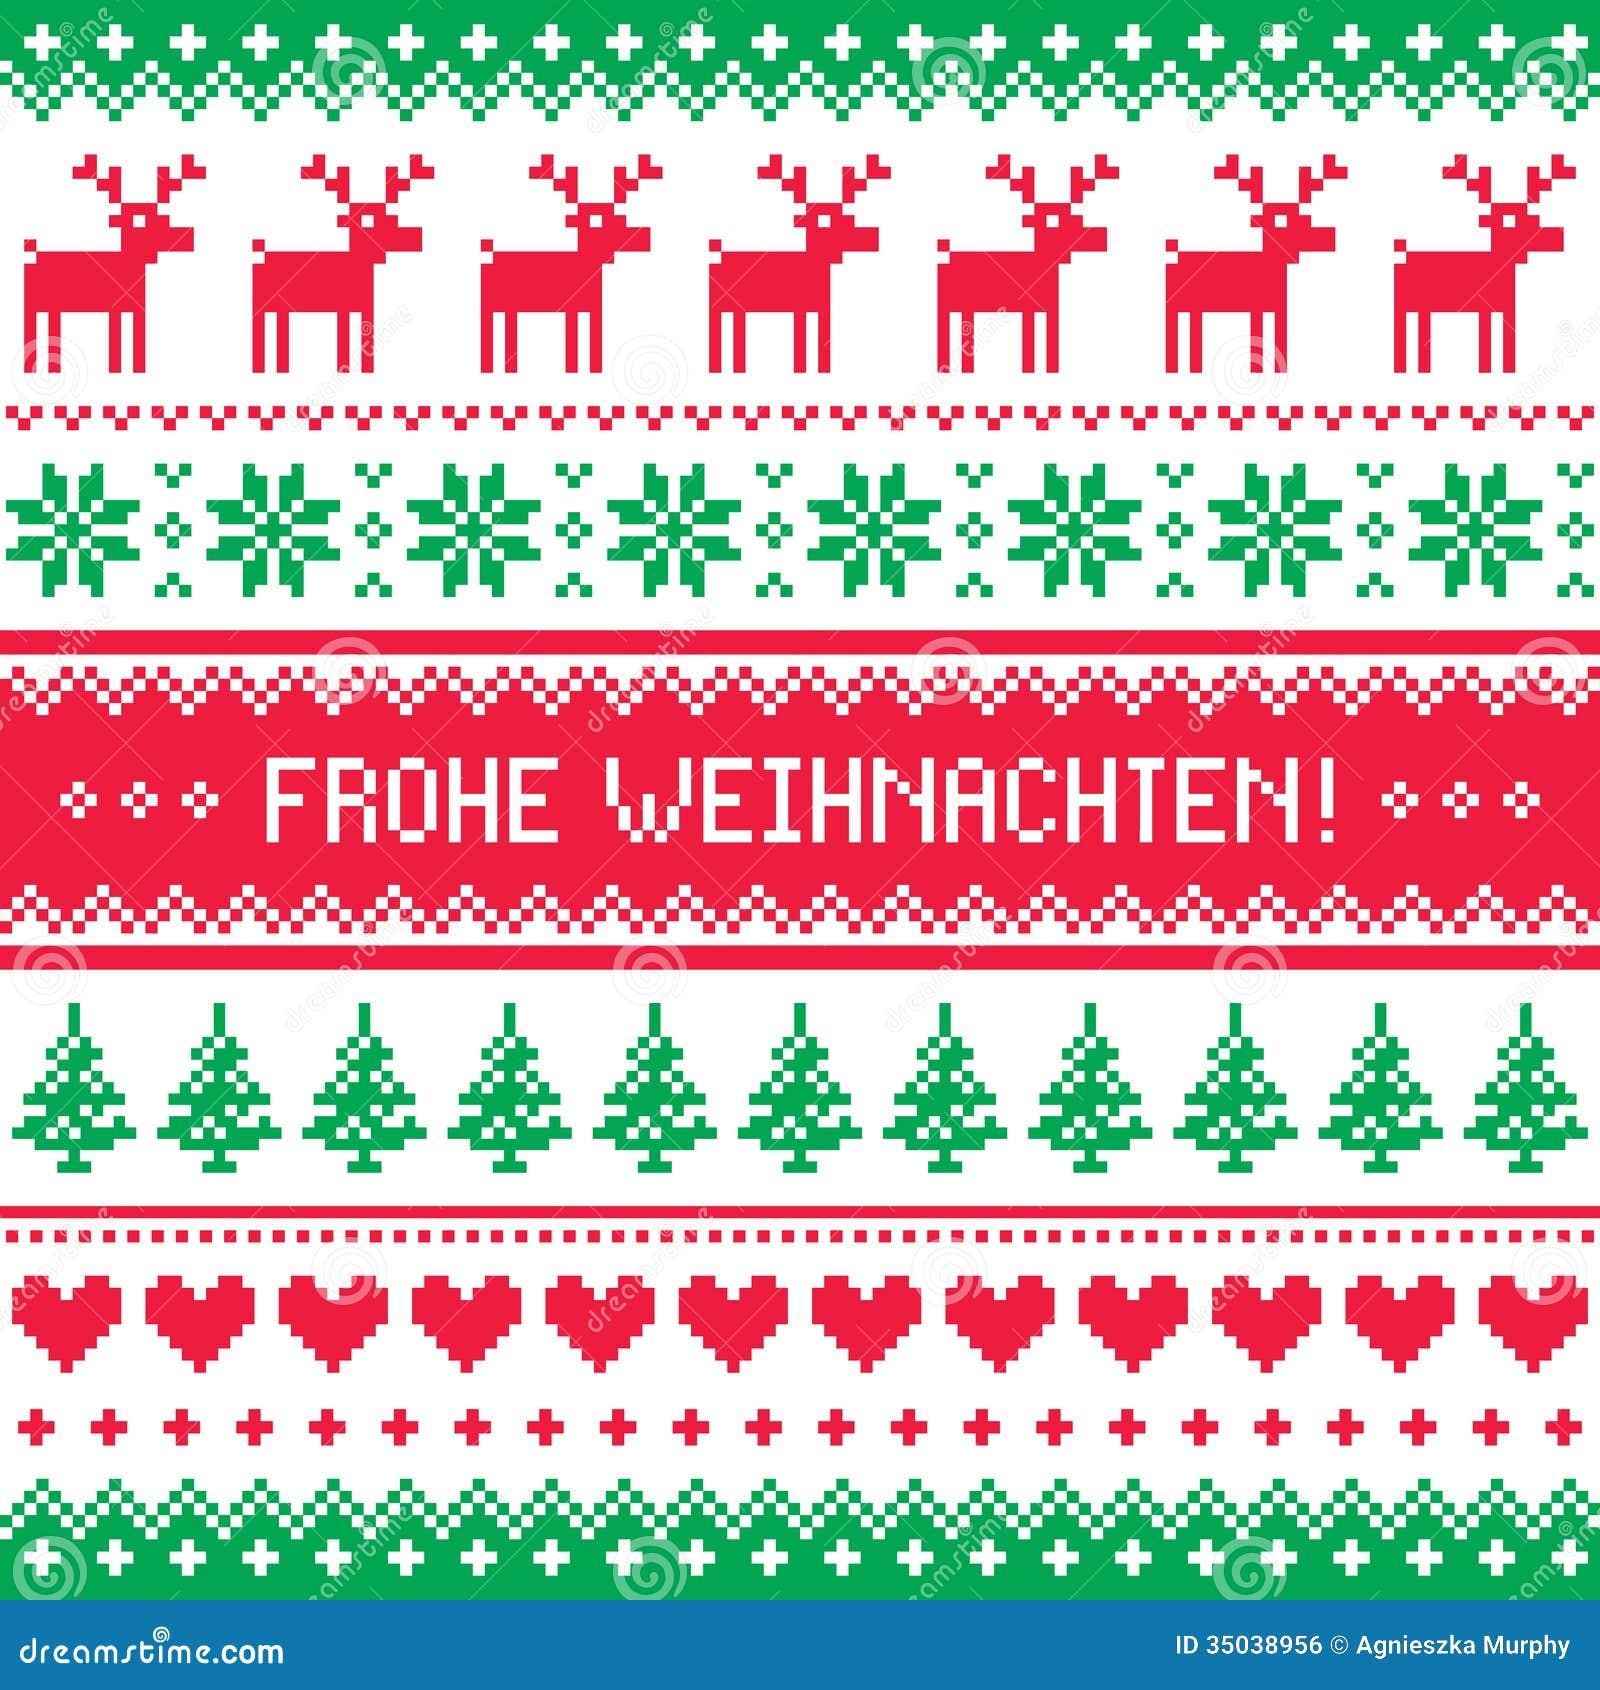 frohe weihnachten card scandynavian christmas pattern. Black Bedroom Furniture Sets. Home Design Ideas